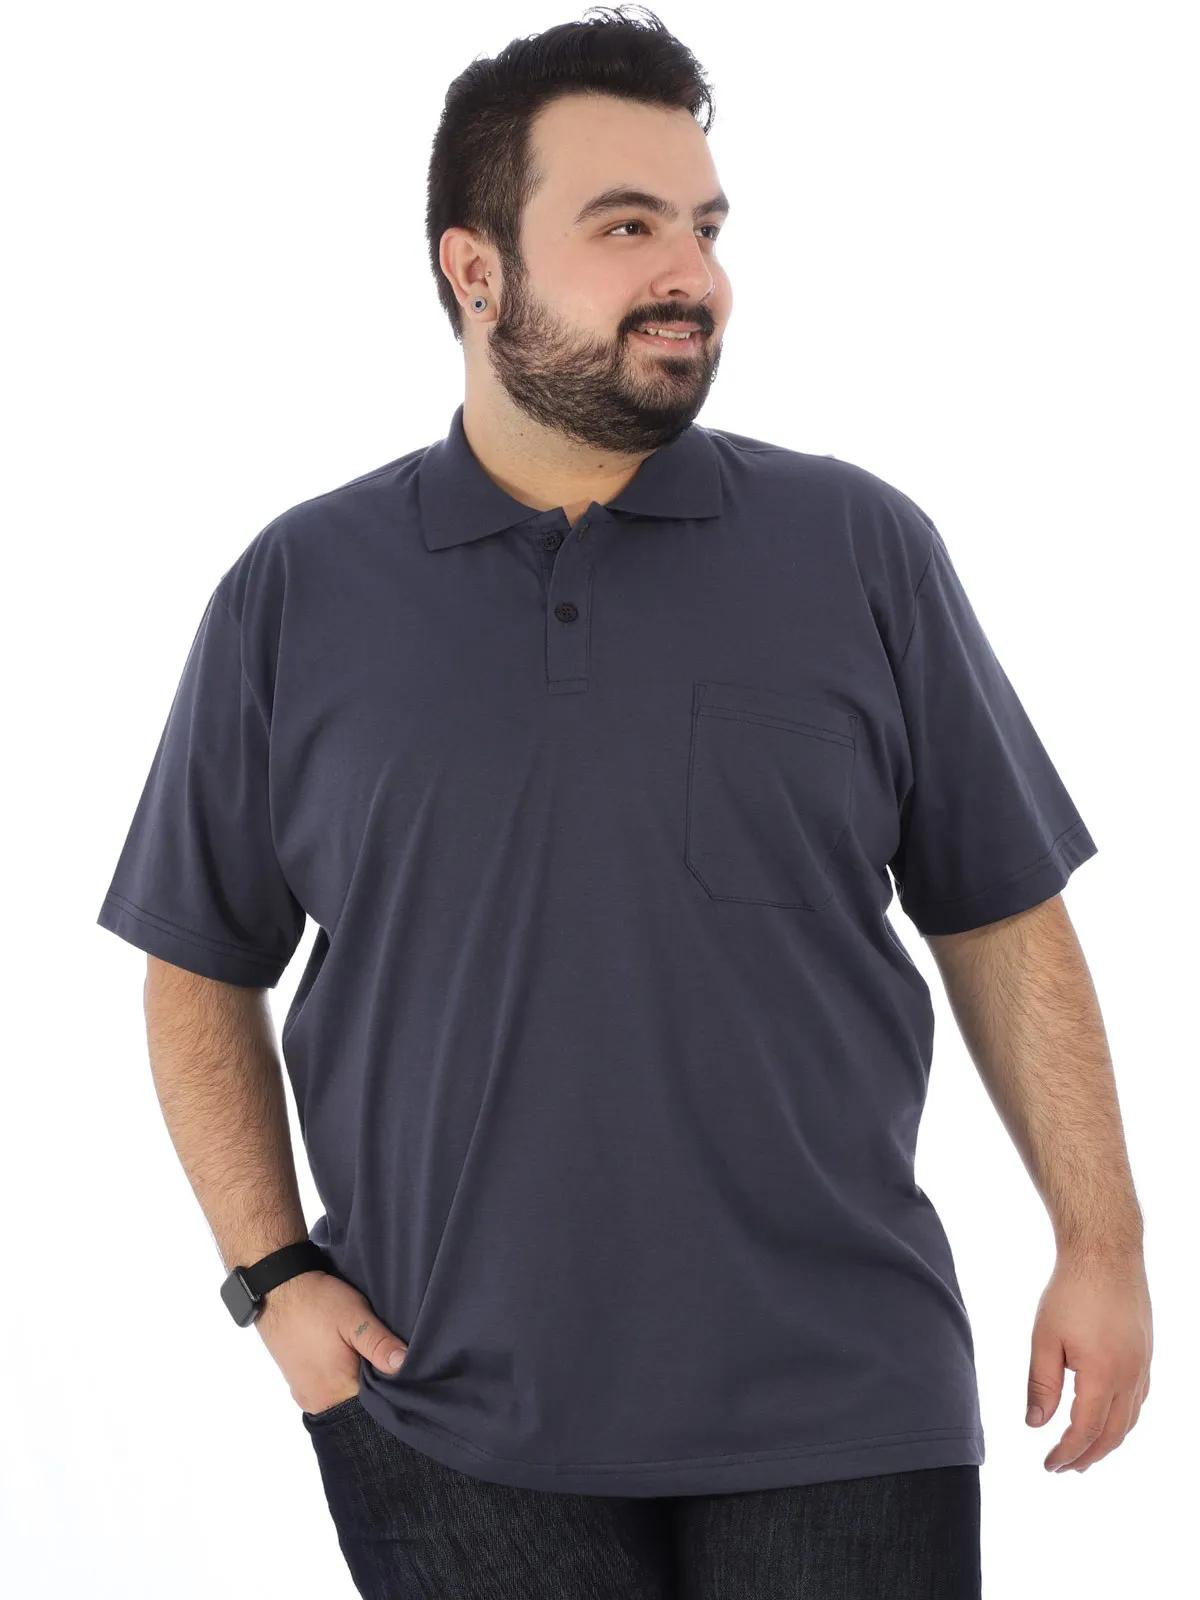 Camisa Polo Plus Size Masculina Básica C/ Bolso Grafite